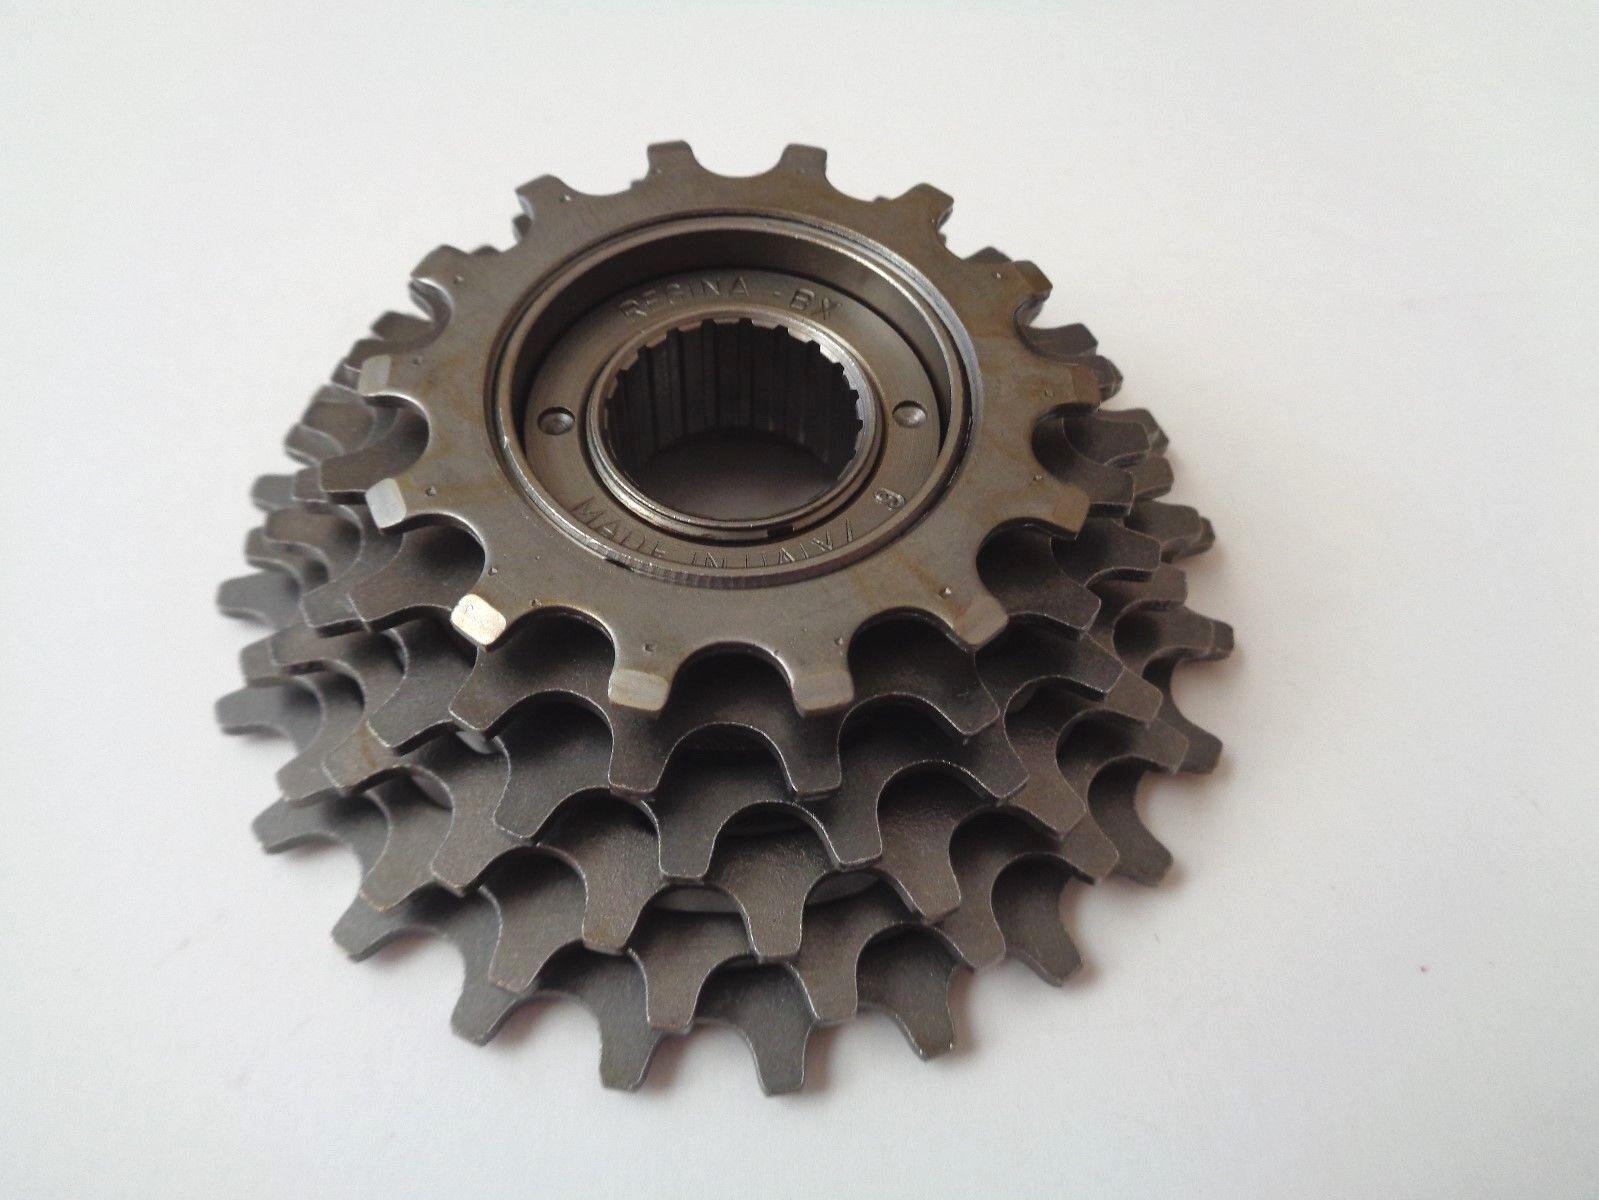 NOS Vintage 1980s REGINA BX  14-24 cogs 6 Speed FRENCH freewheel cassette  reasonable price